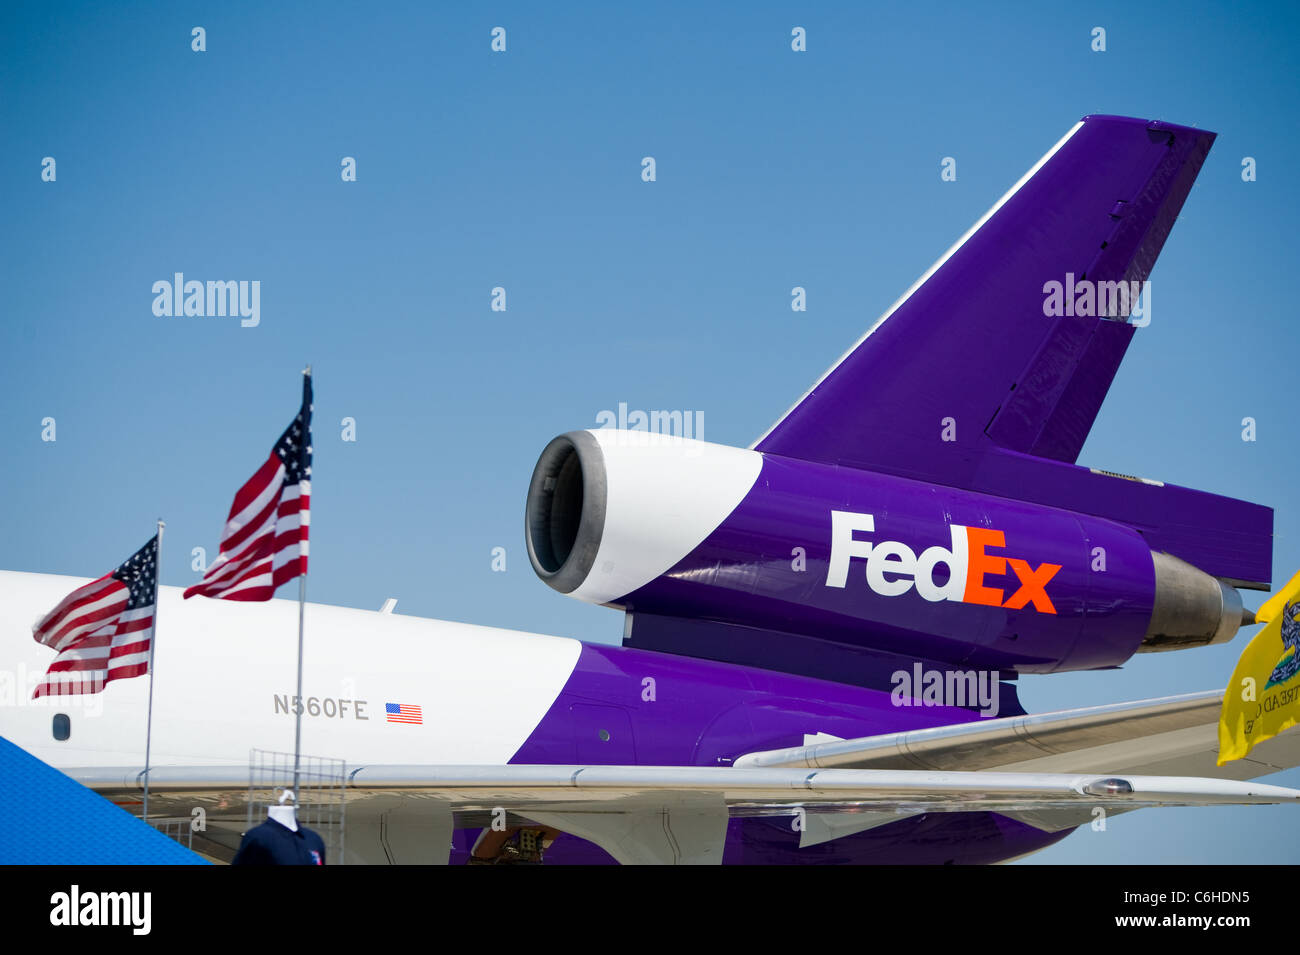 Fedex Logo Sign Symbol On Turbine Engine Of Commercial Aircraft